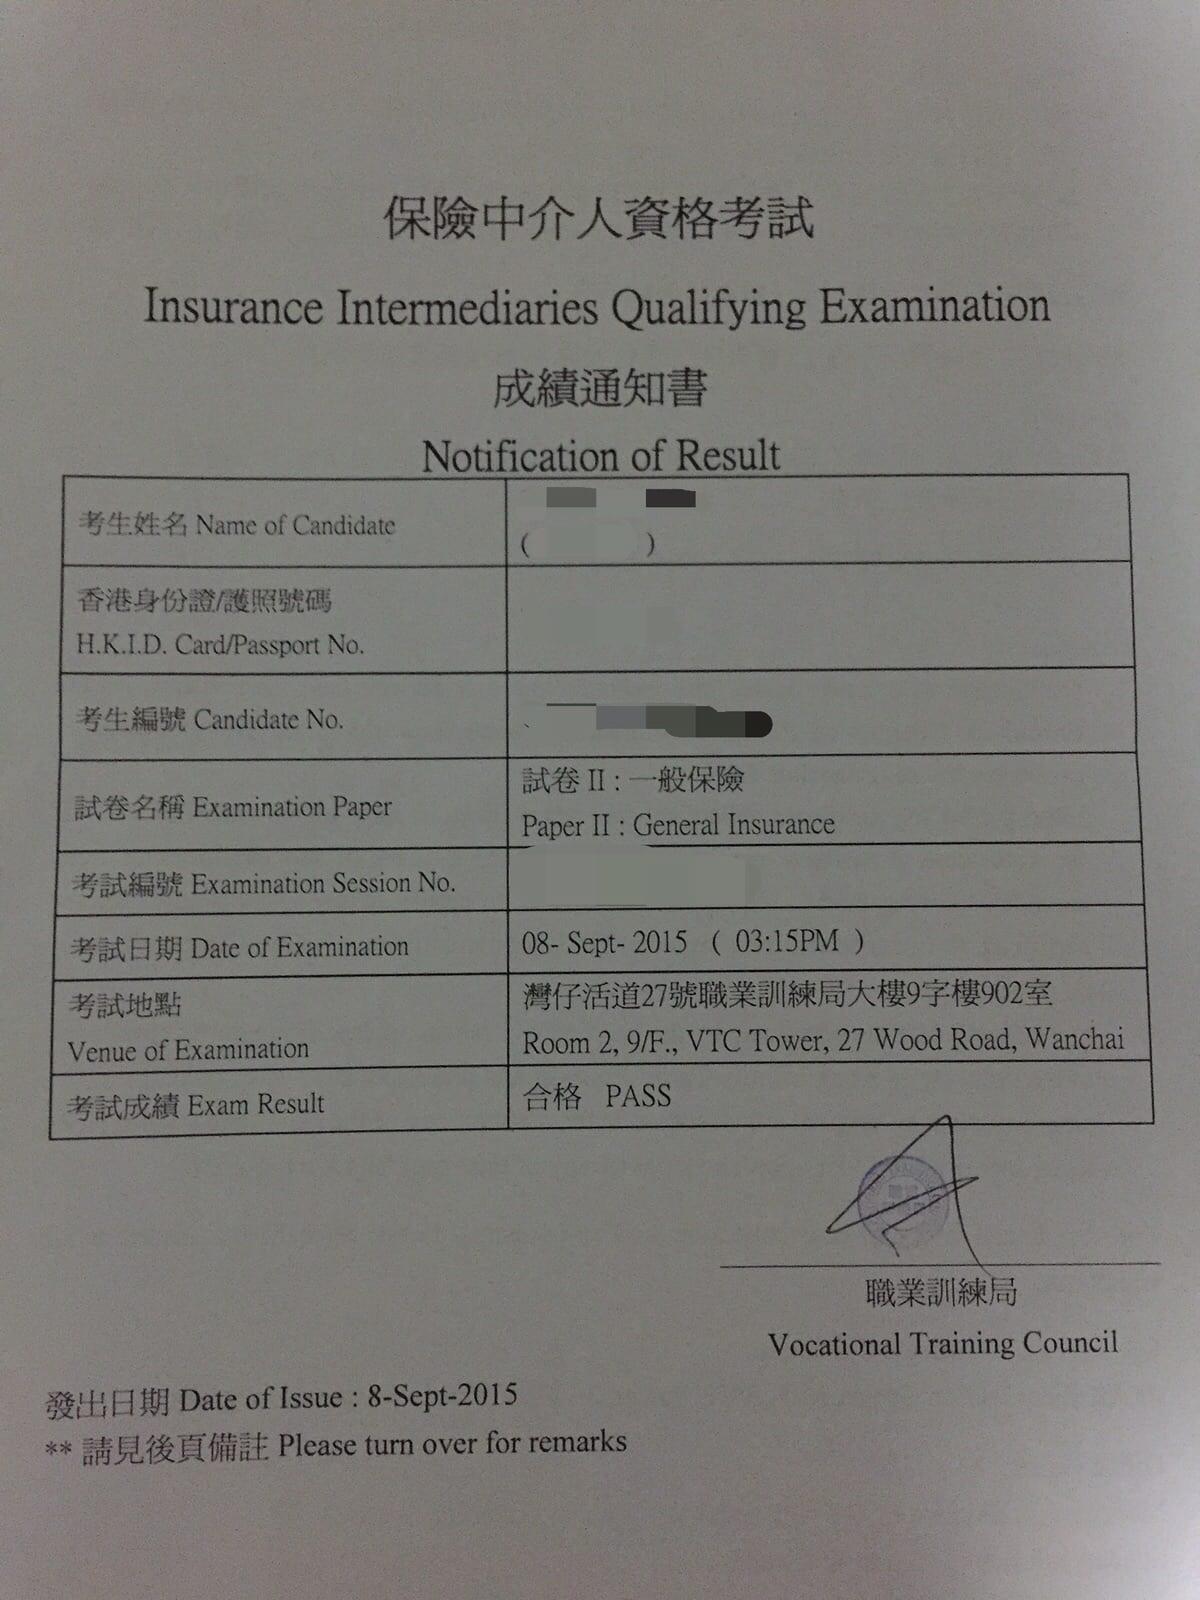 Billysin 8/9/2015 IIQE Paper 2 Pass